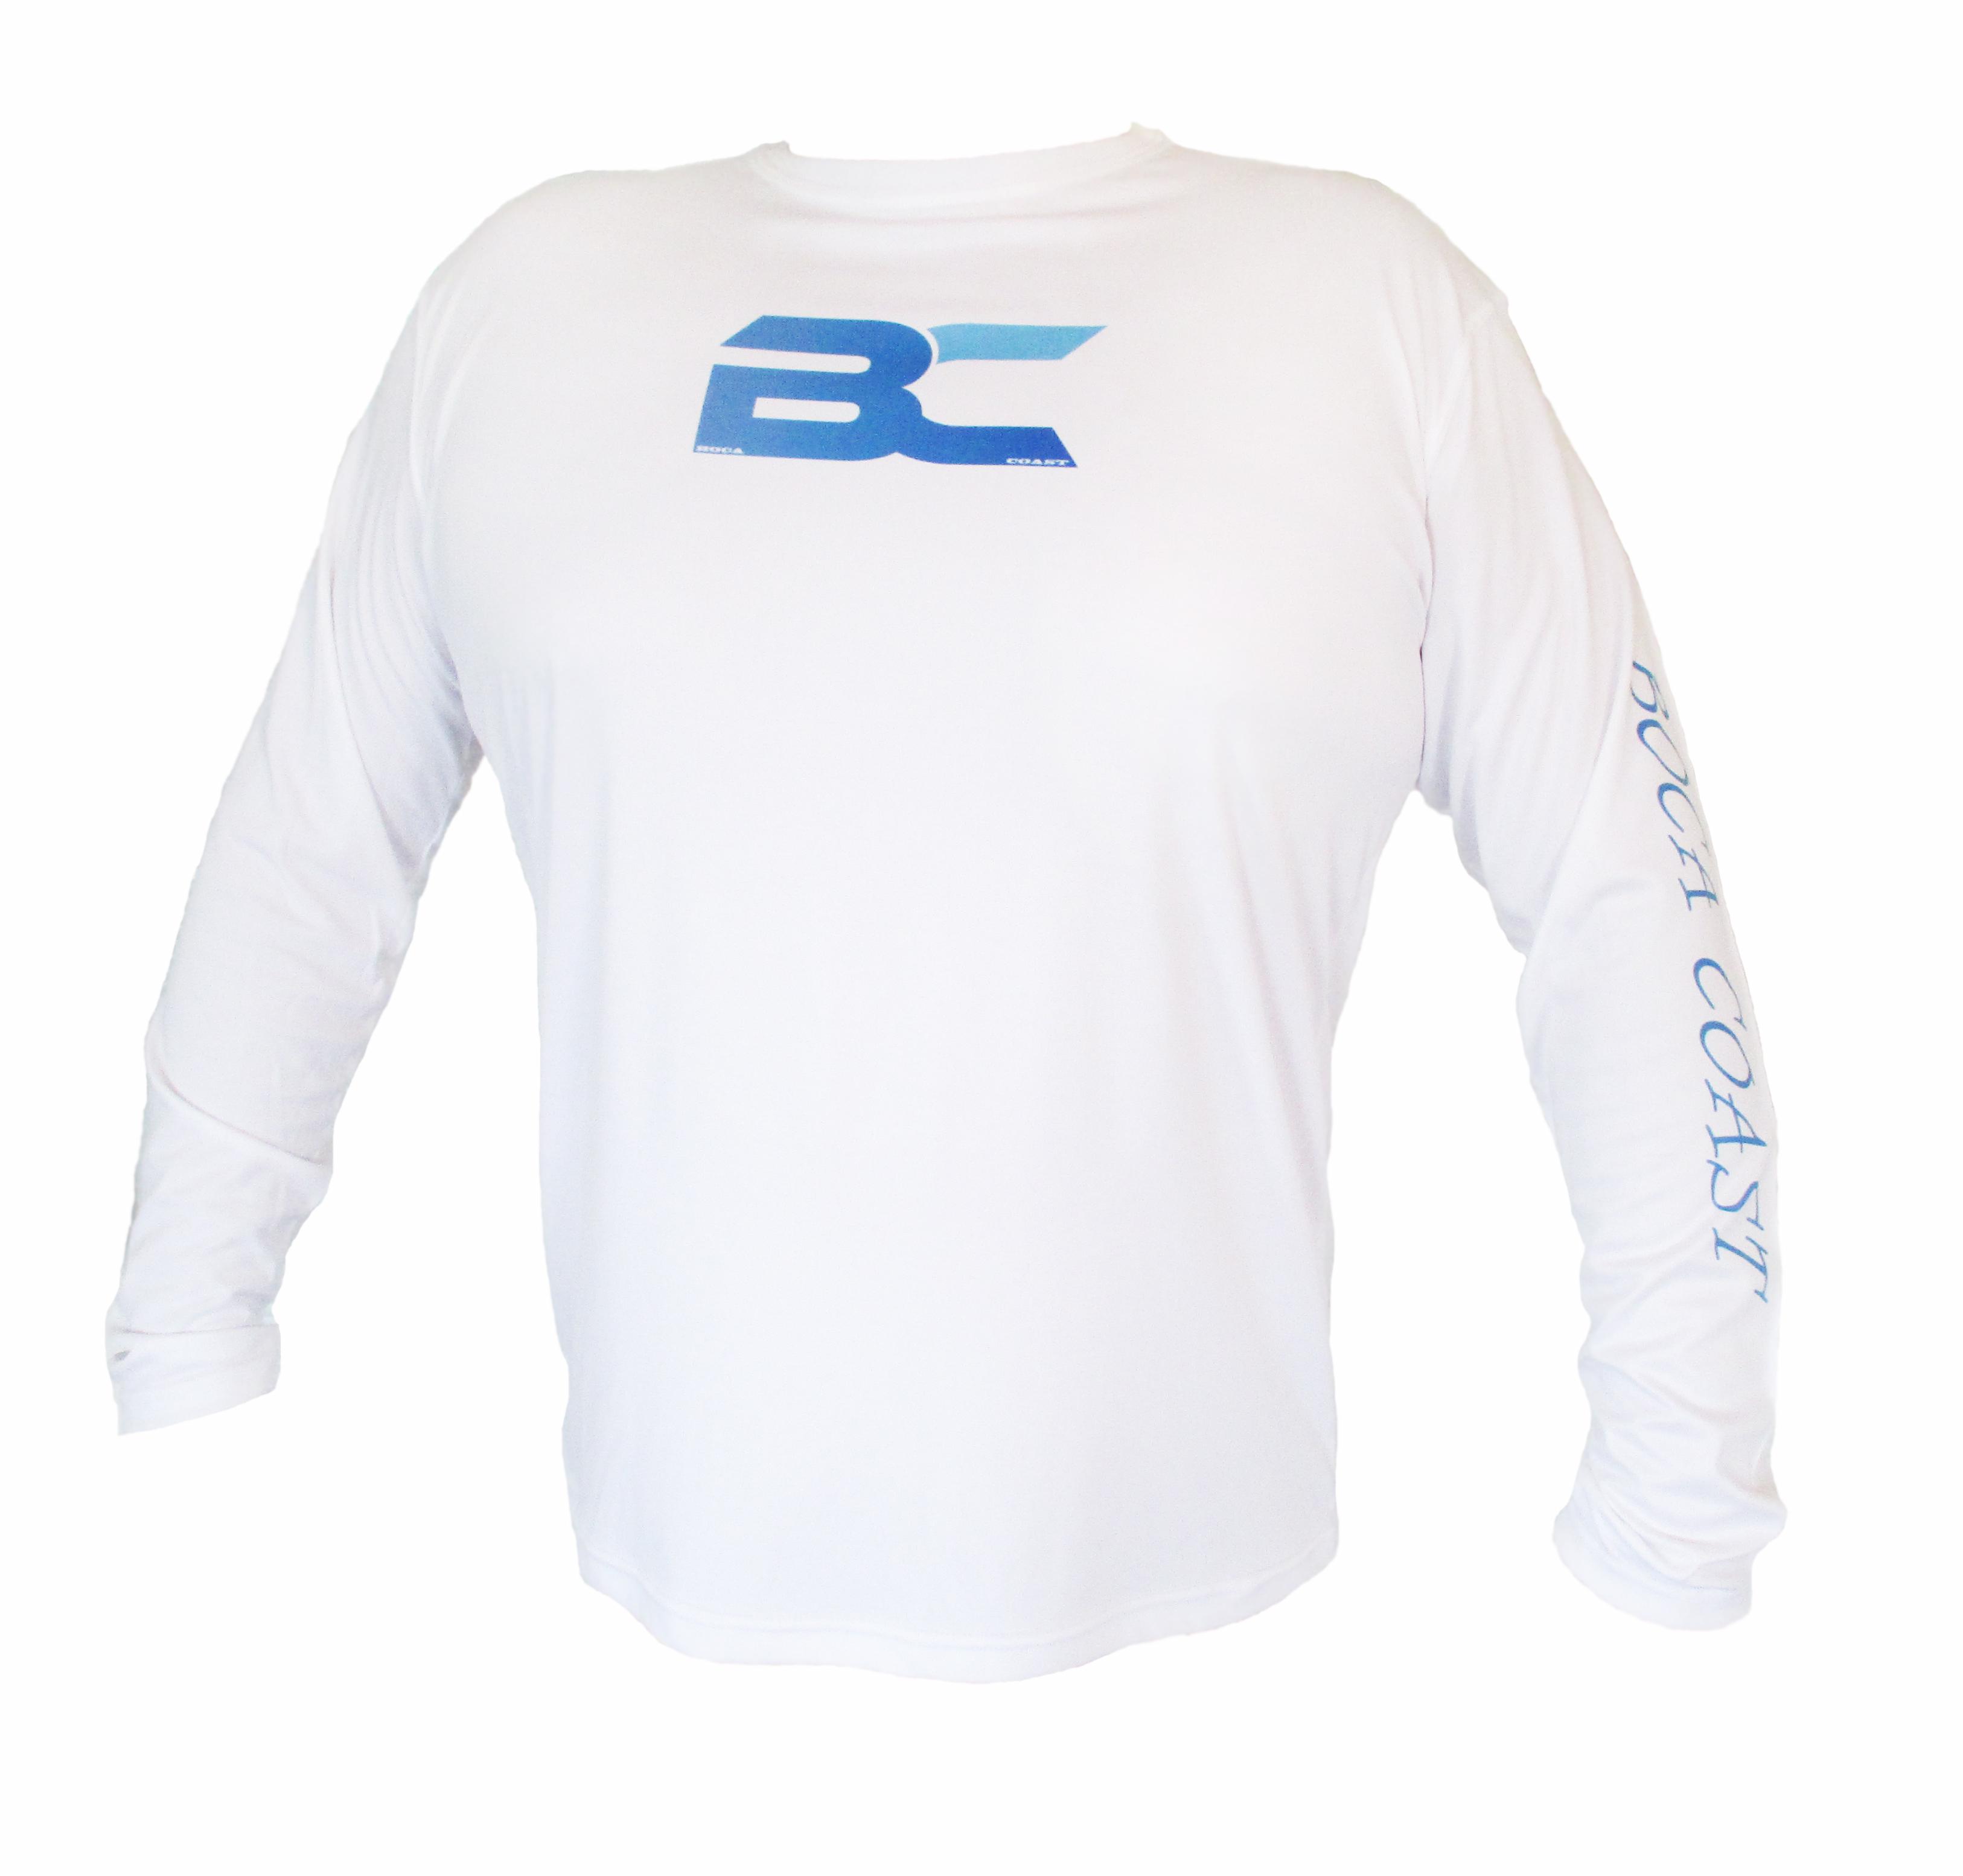 BC long sleeve fishing performance shirt